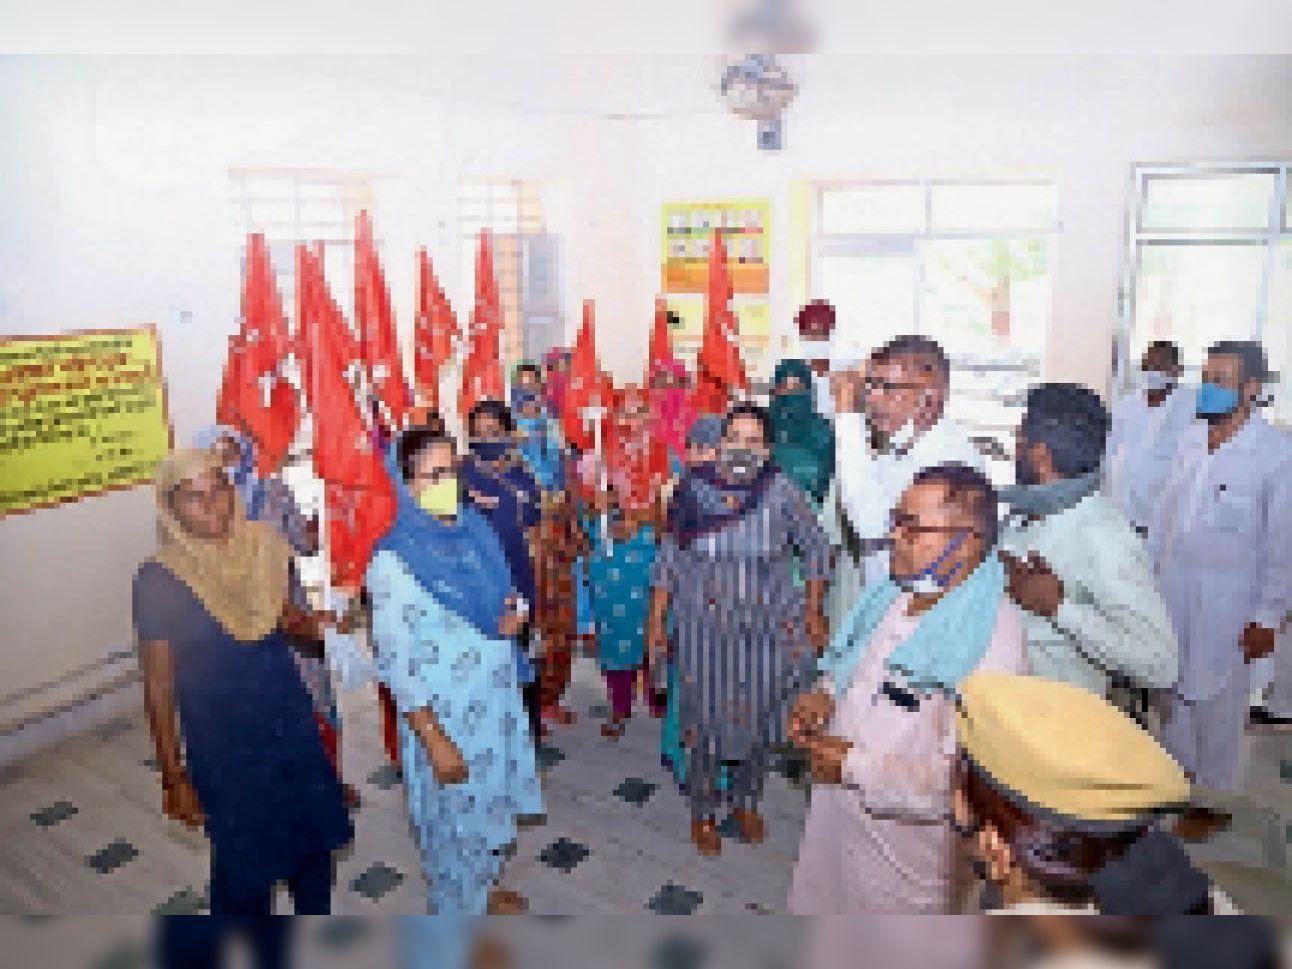 नाराजगी जाहिर करतीं महिलाएं - Dainik Bhaskar